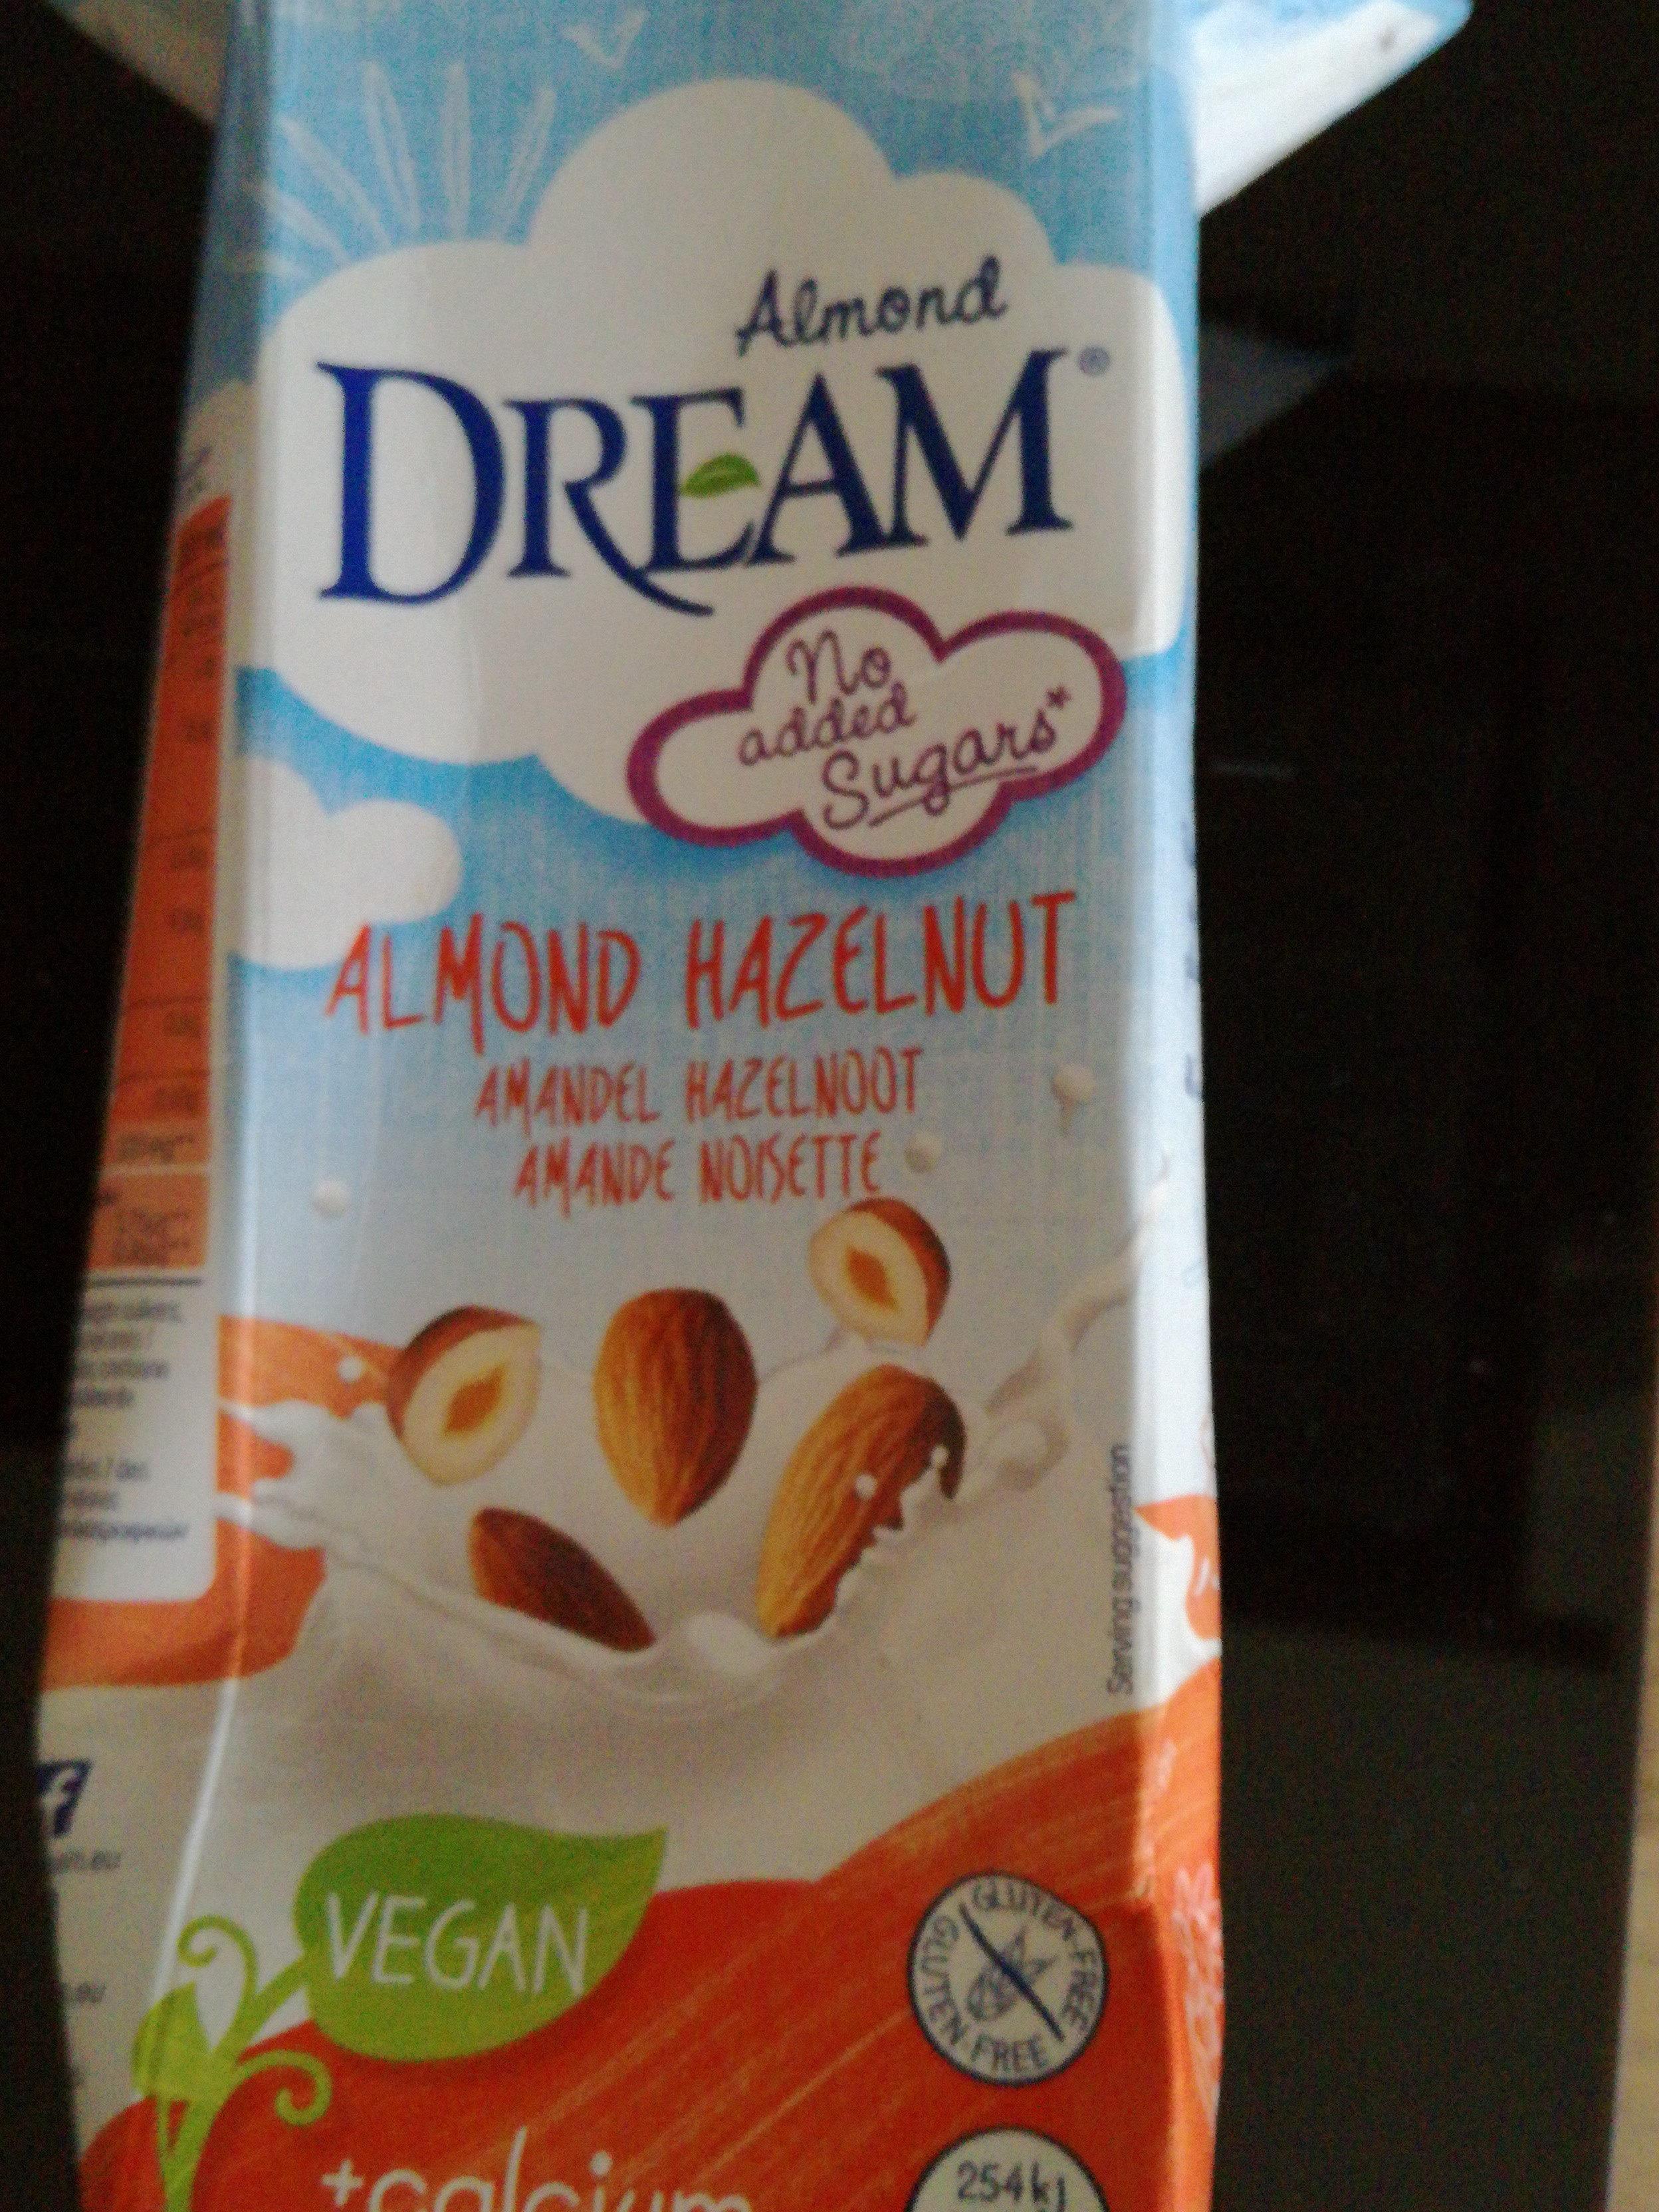 amande noisette vegan - Produit